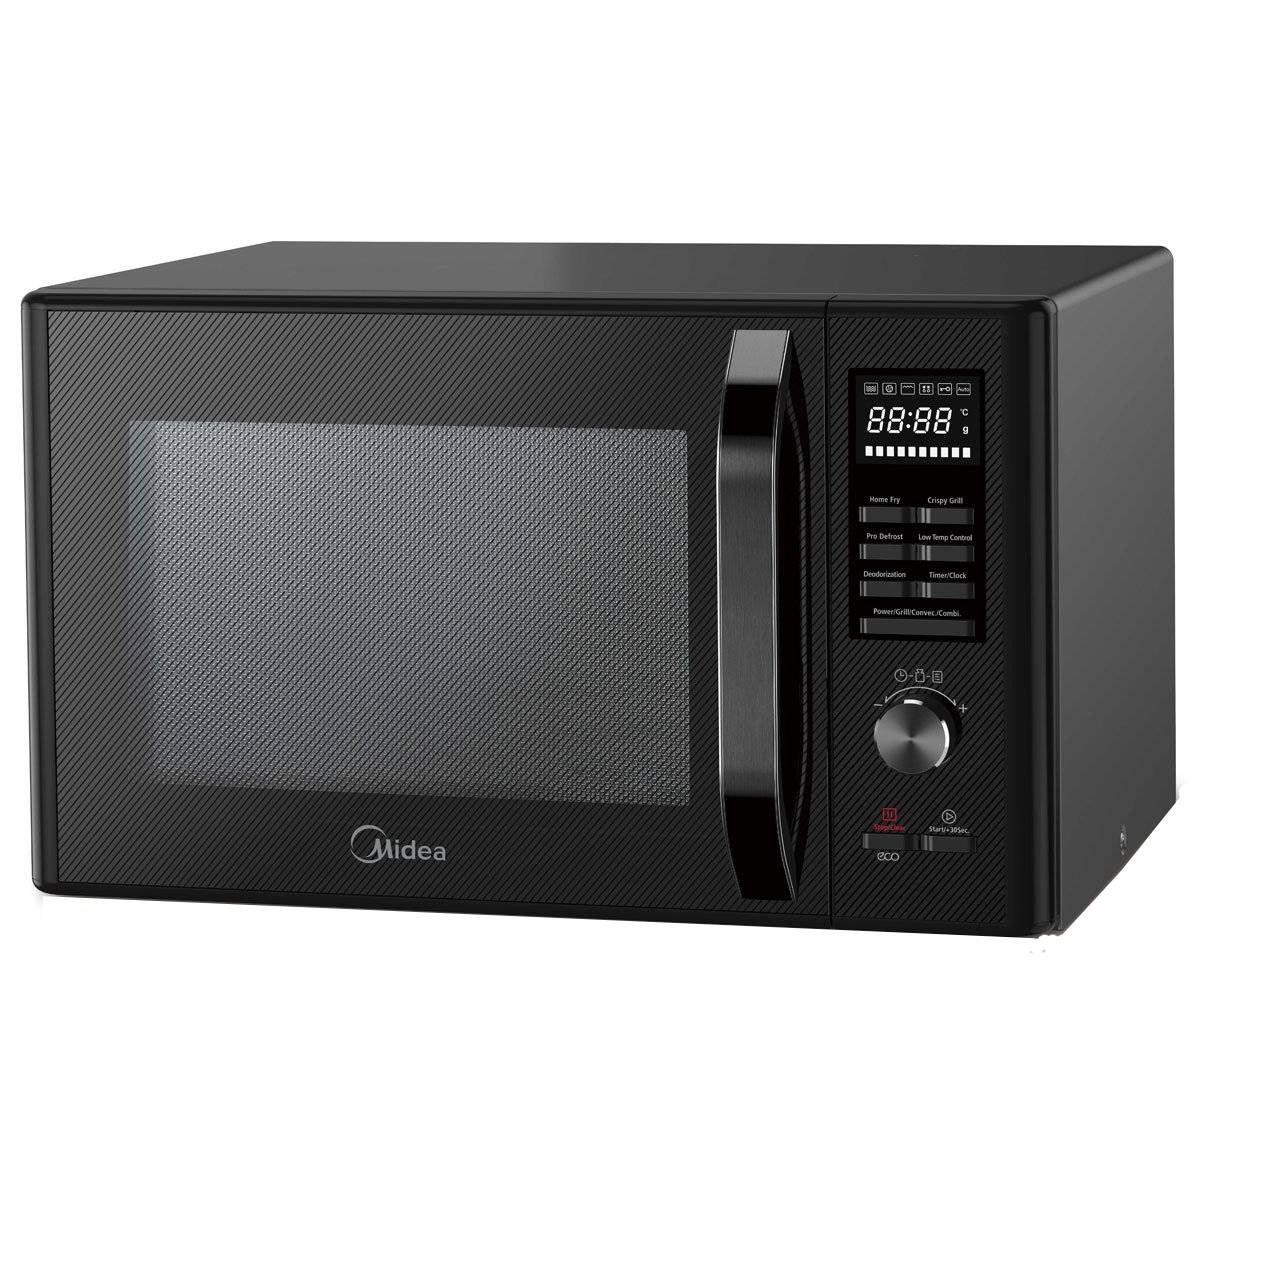 Midea MMWV30 Microwave